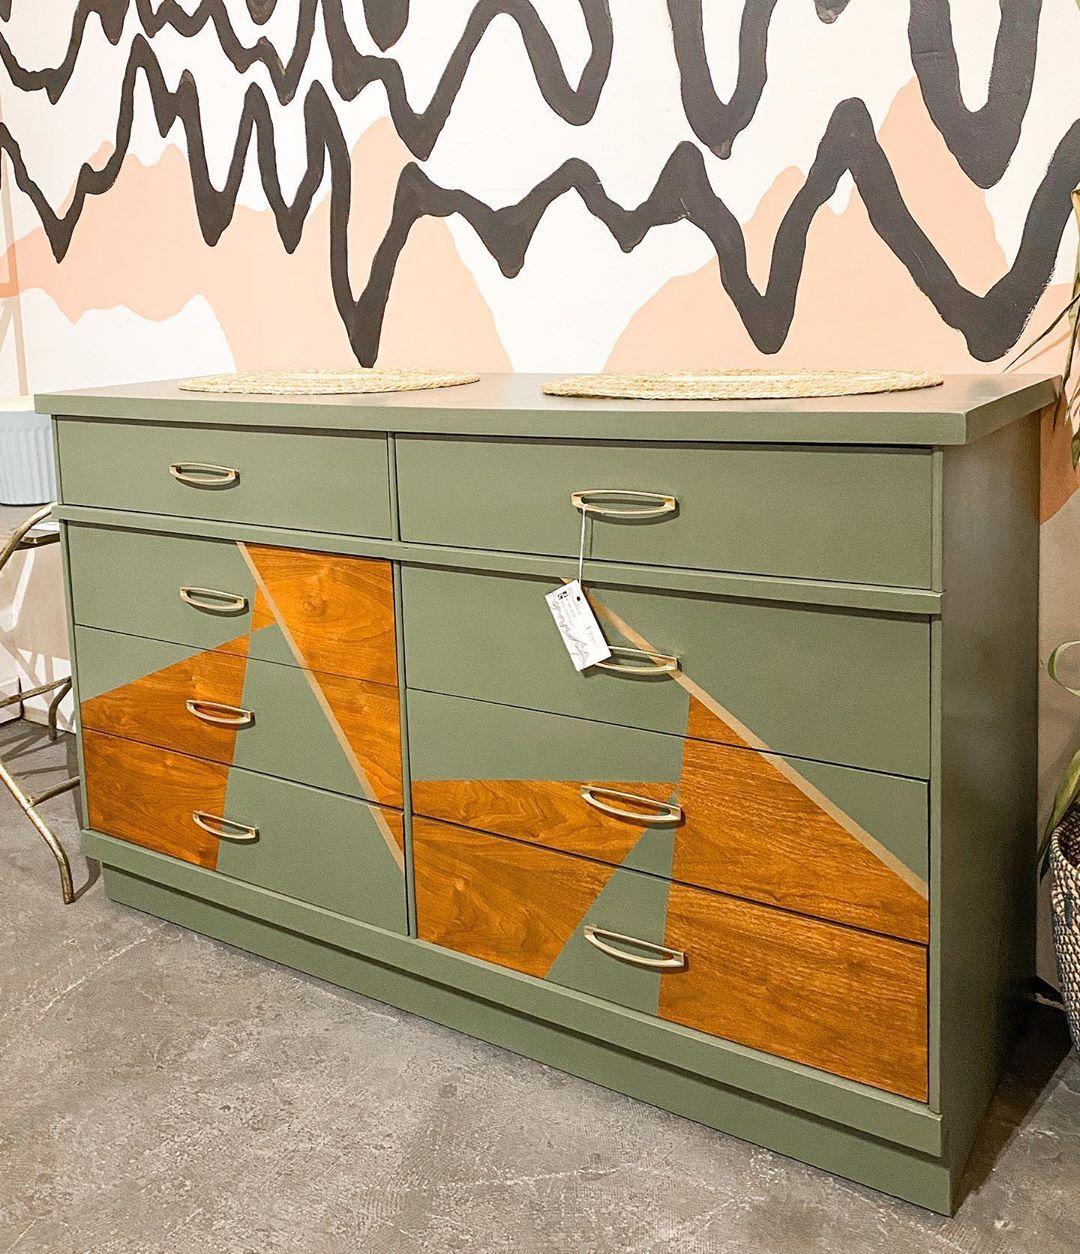 "Mikey (M Mid Mod) on Instagram: ""We love a geometric piece 💁🏼♂️ . . . . . . #midcenturymodern #modernfurniture #furniture #furnitureflip #fleamarketflip #mcmfurniture…"""